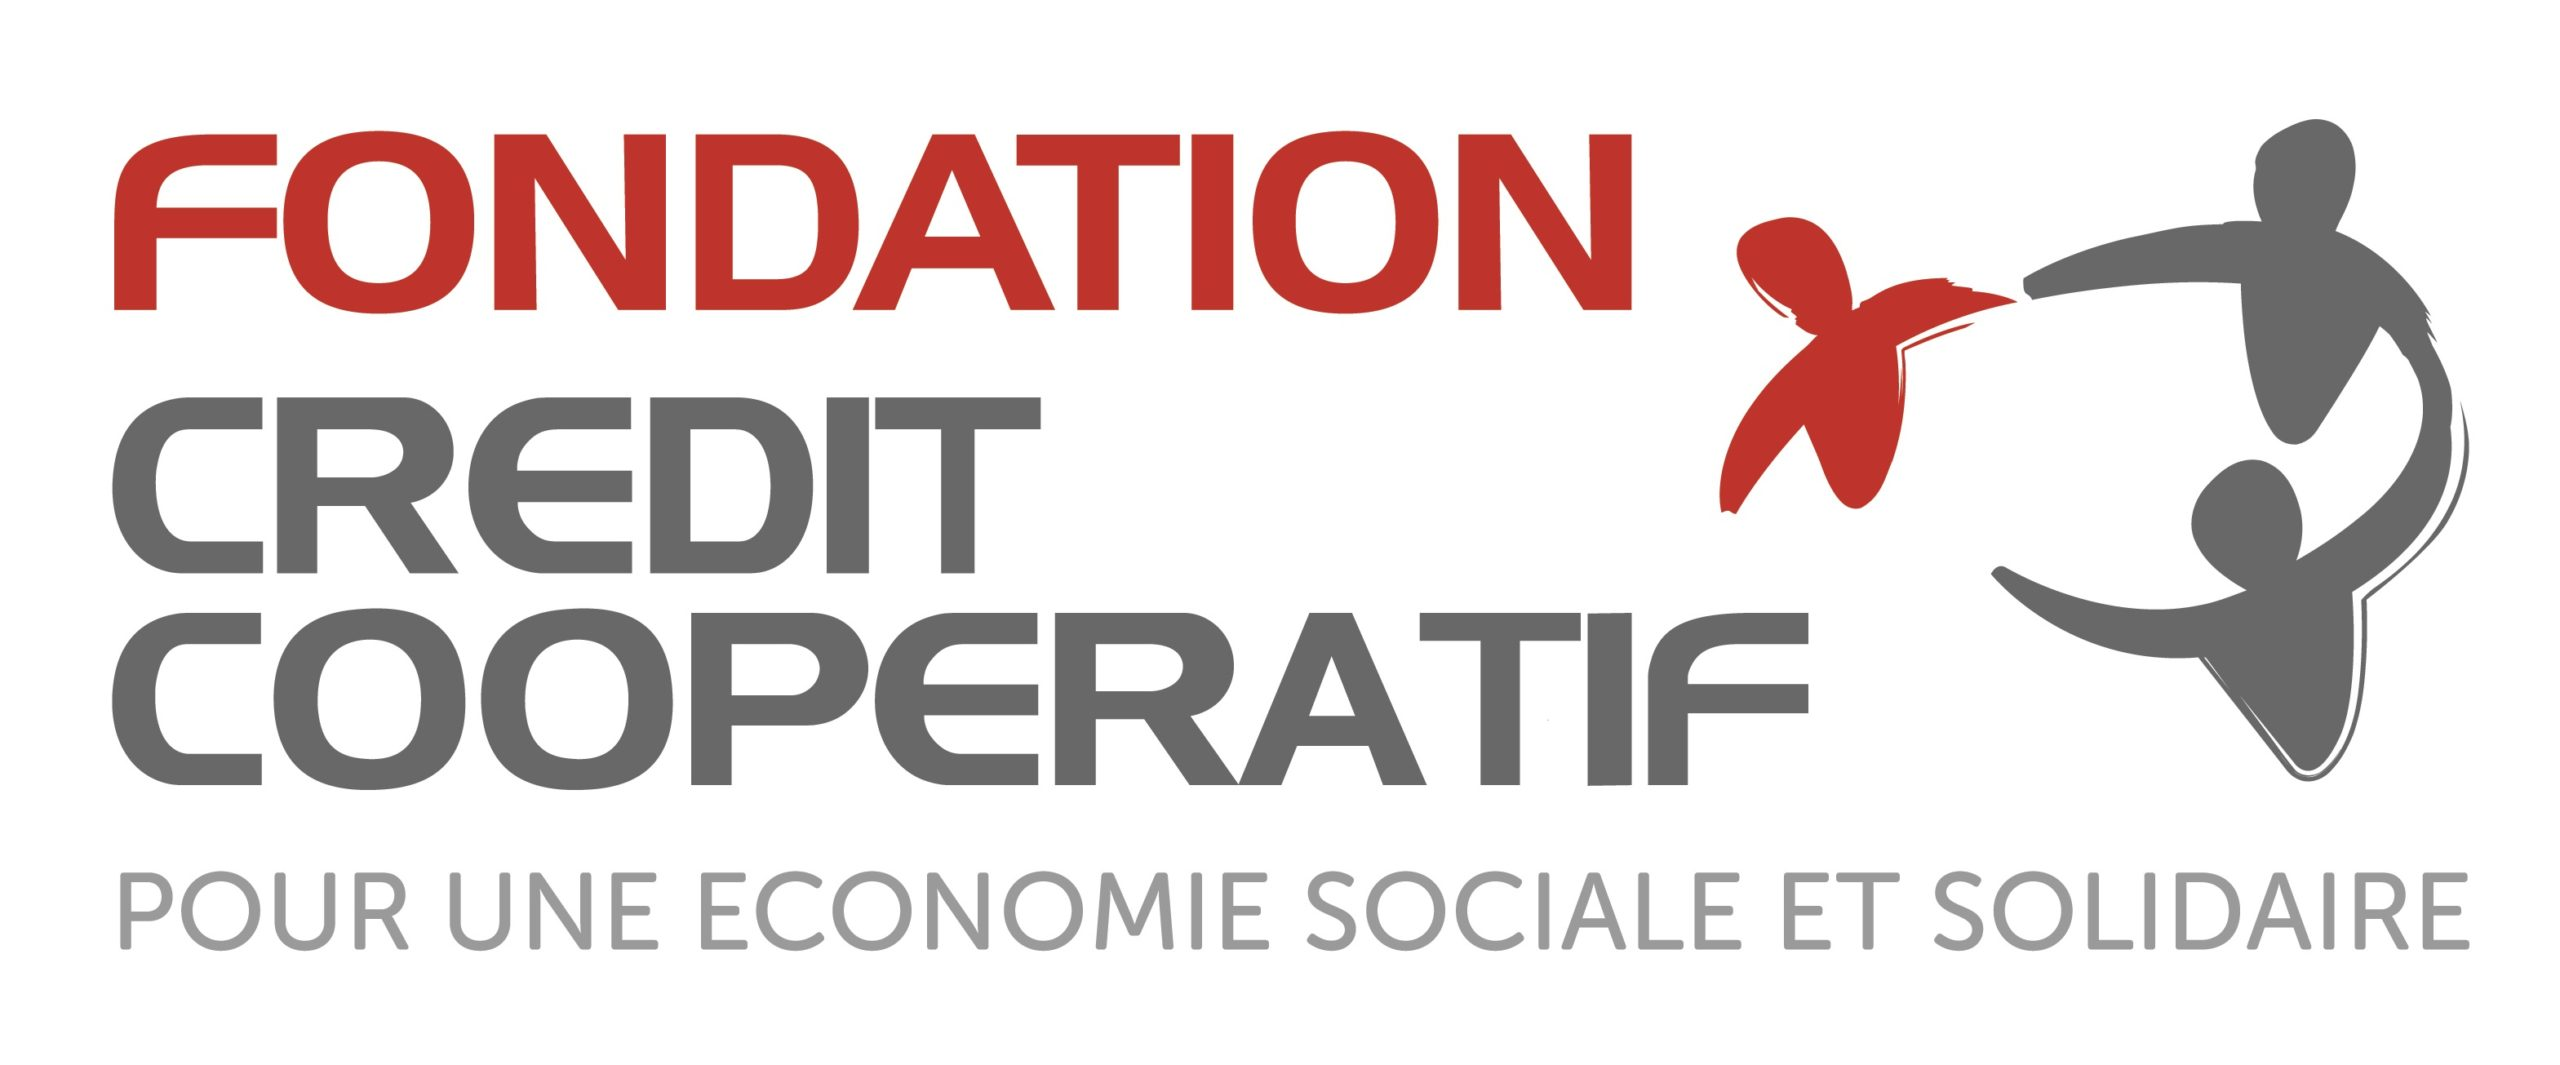 Logo Fondation Crédit Coopératif